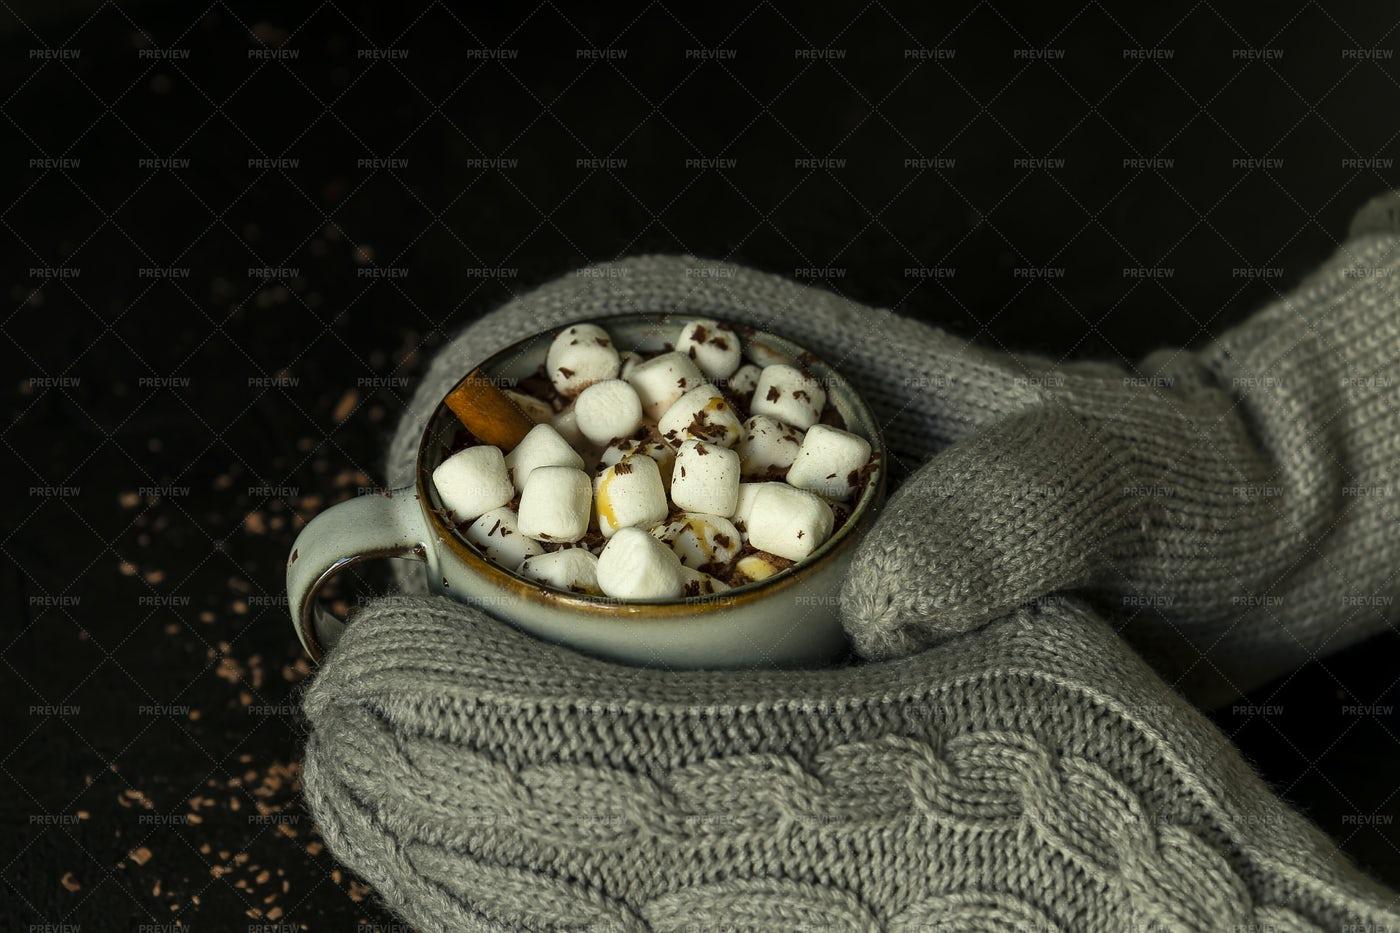 Hot Chocolate And Mittens Close-Up: Stock Photos